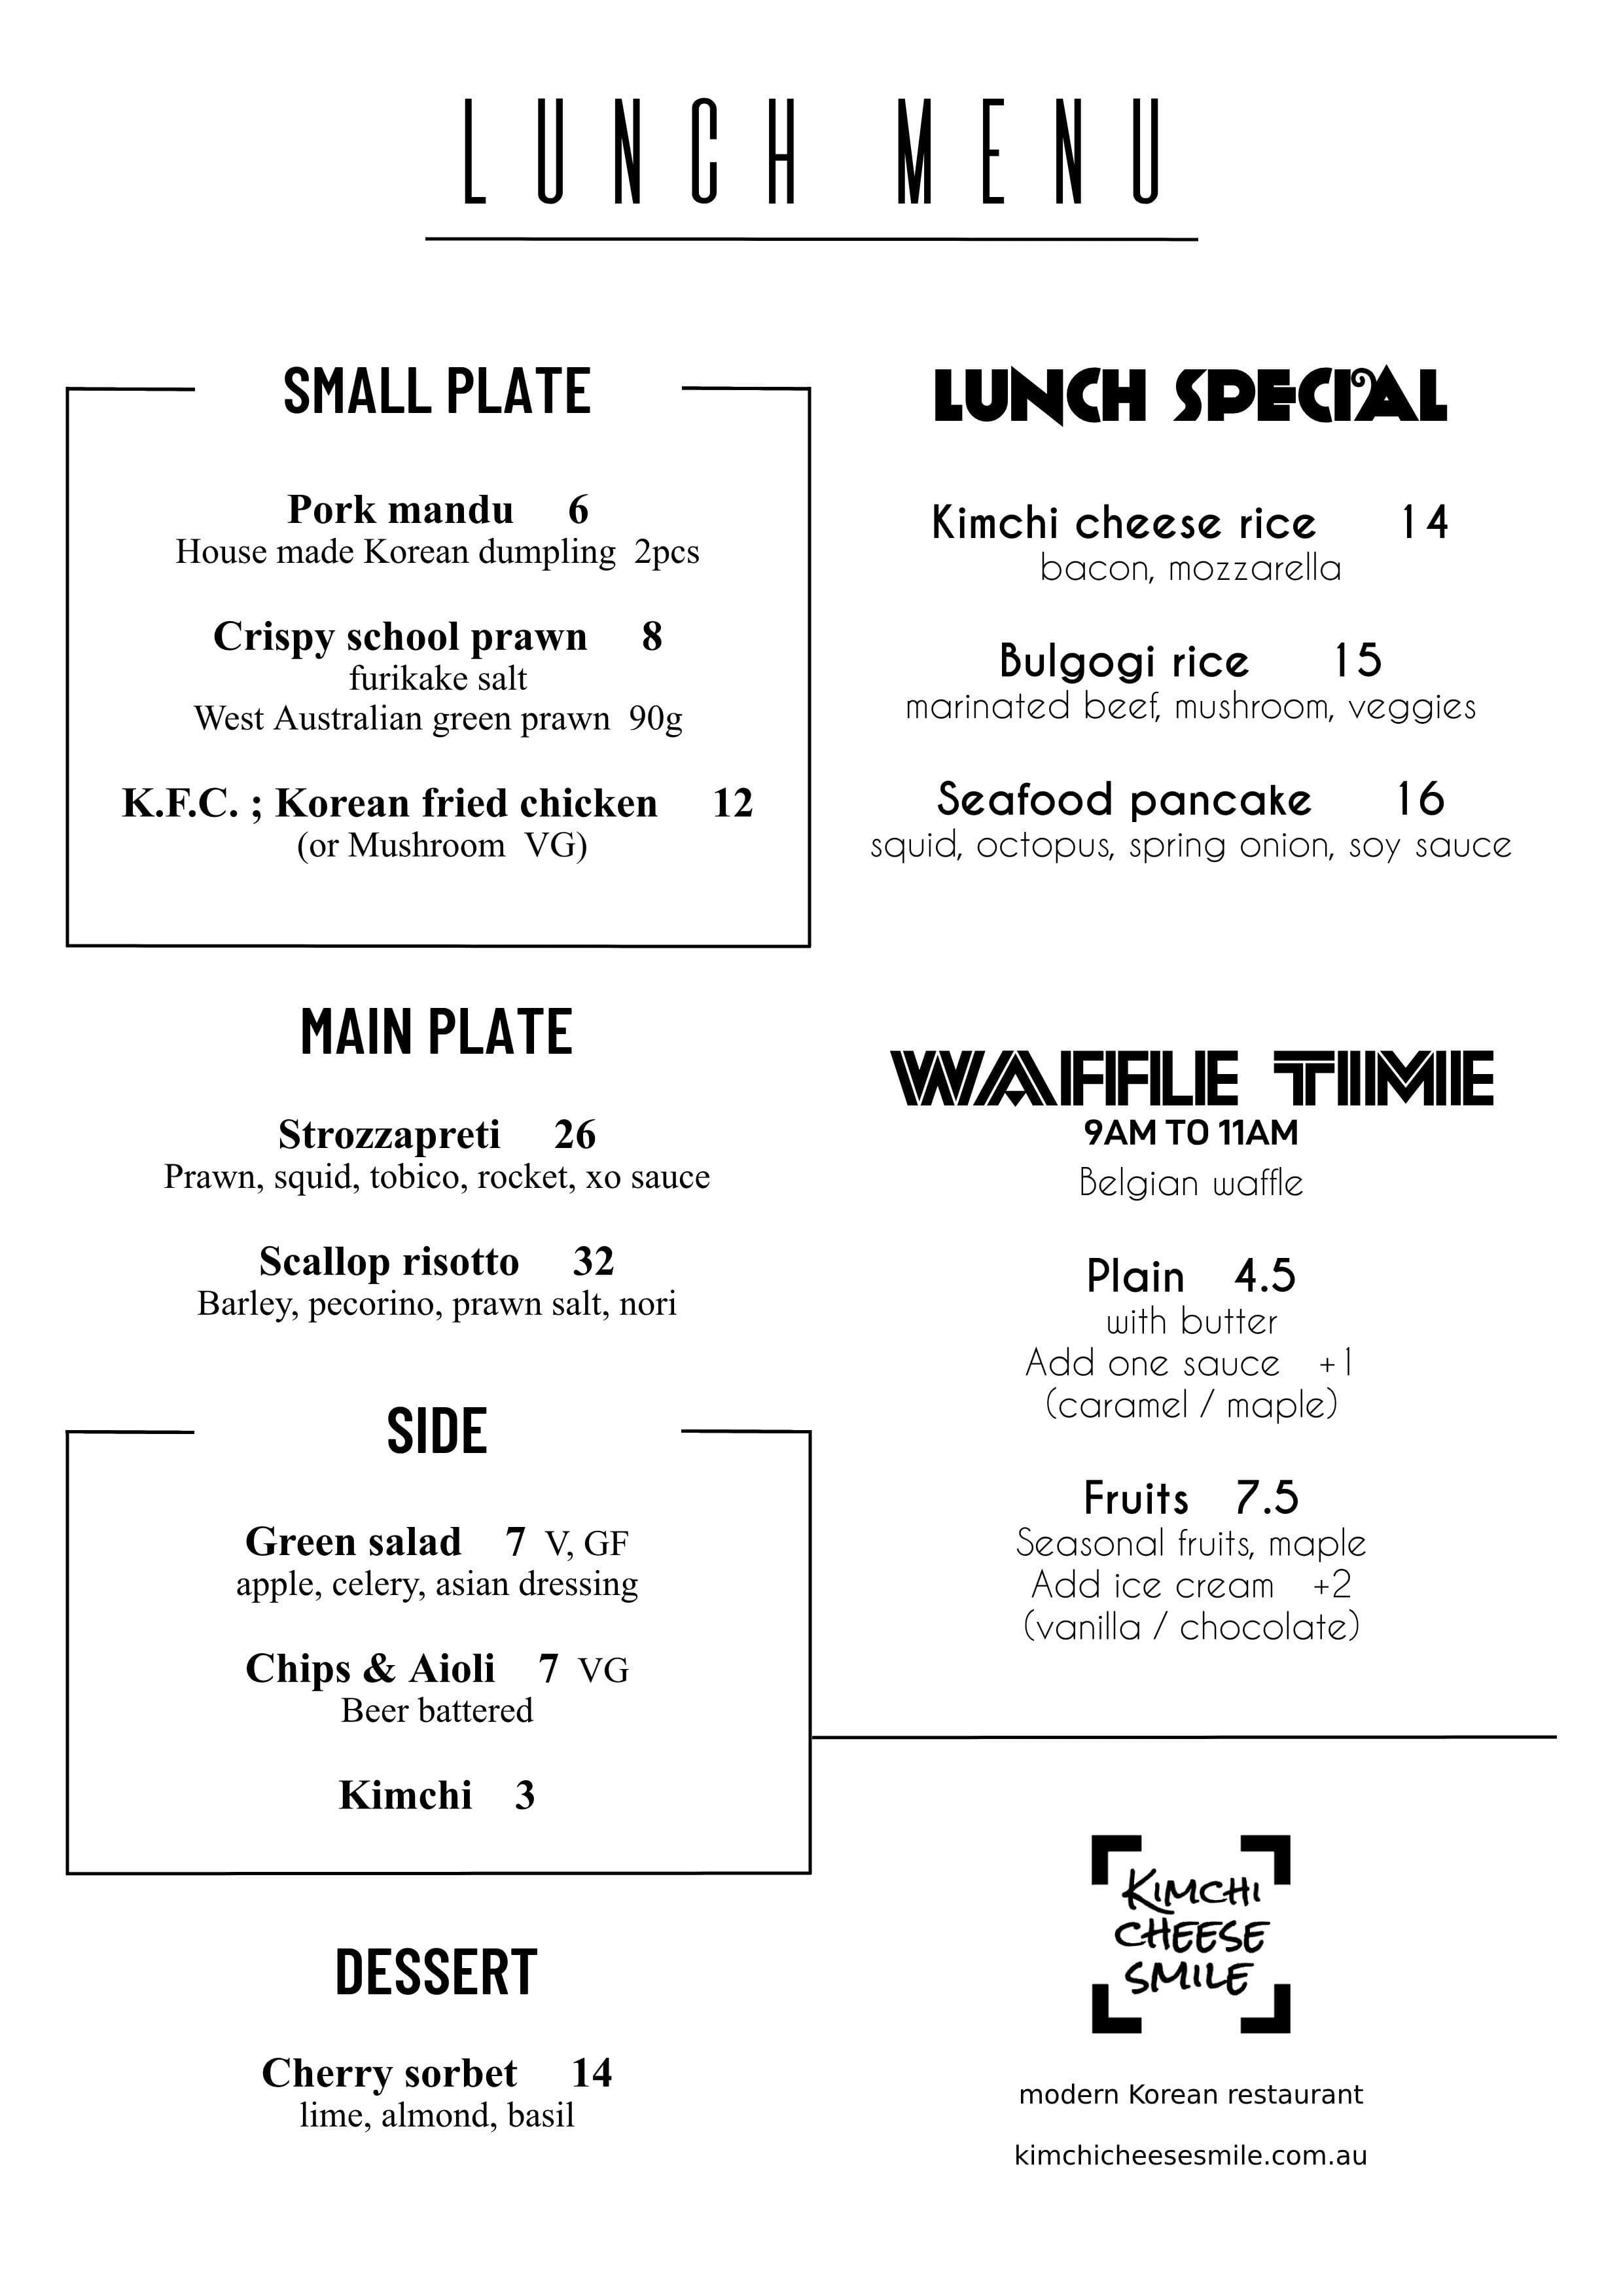 kimchi cheese smile menu menu for kimchi cheese smile